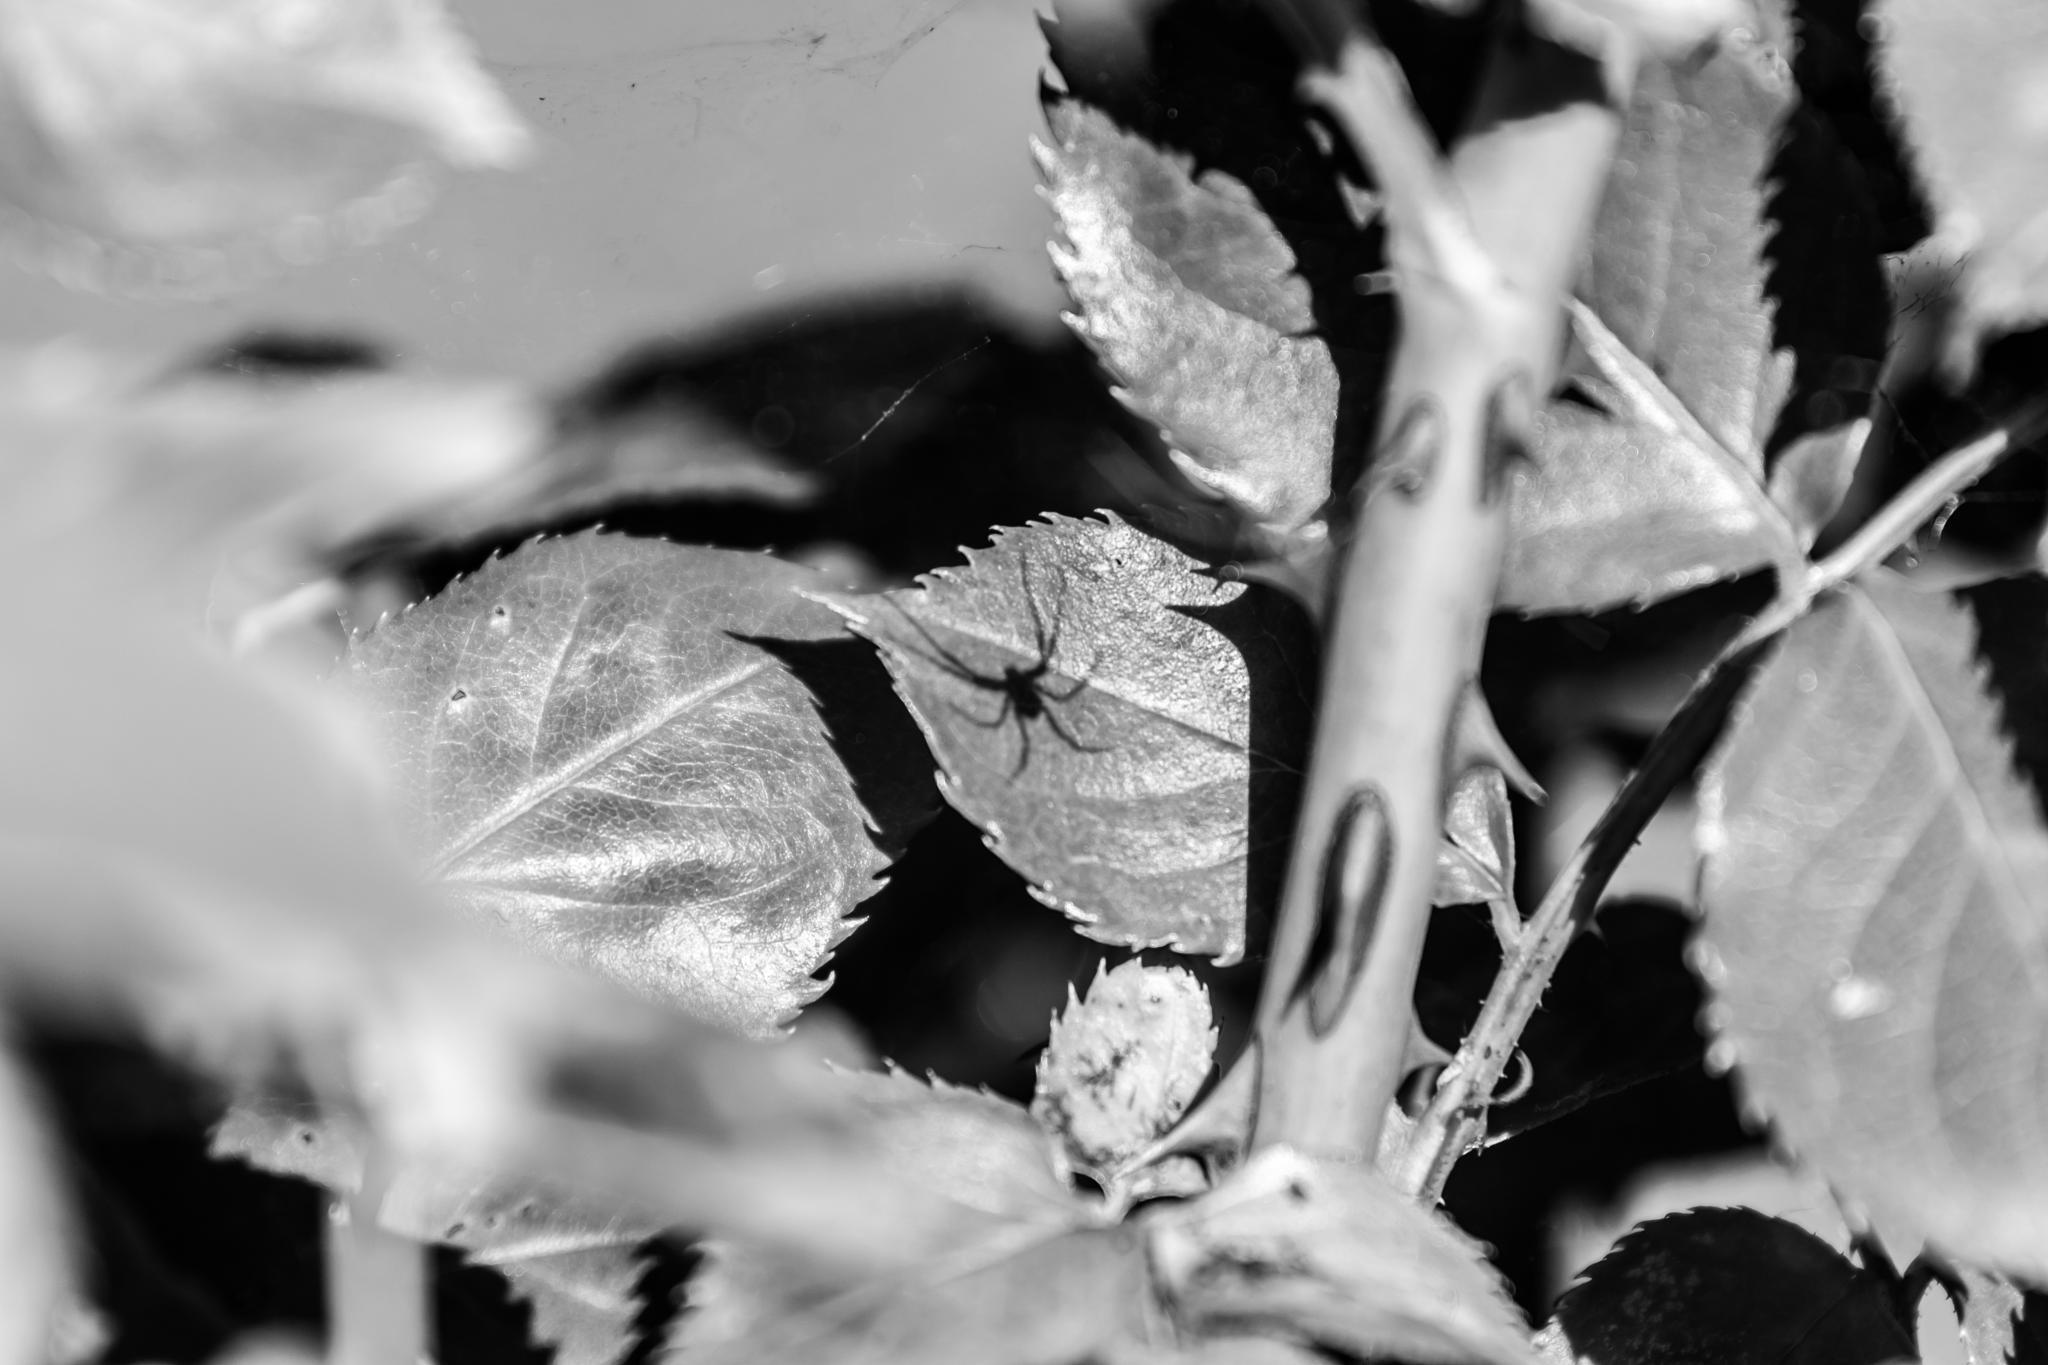 Shadow spider by Laurent Adien